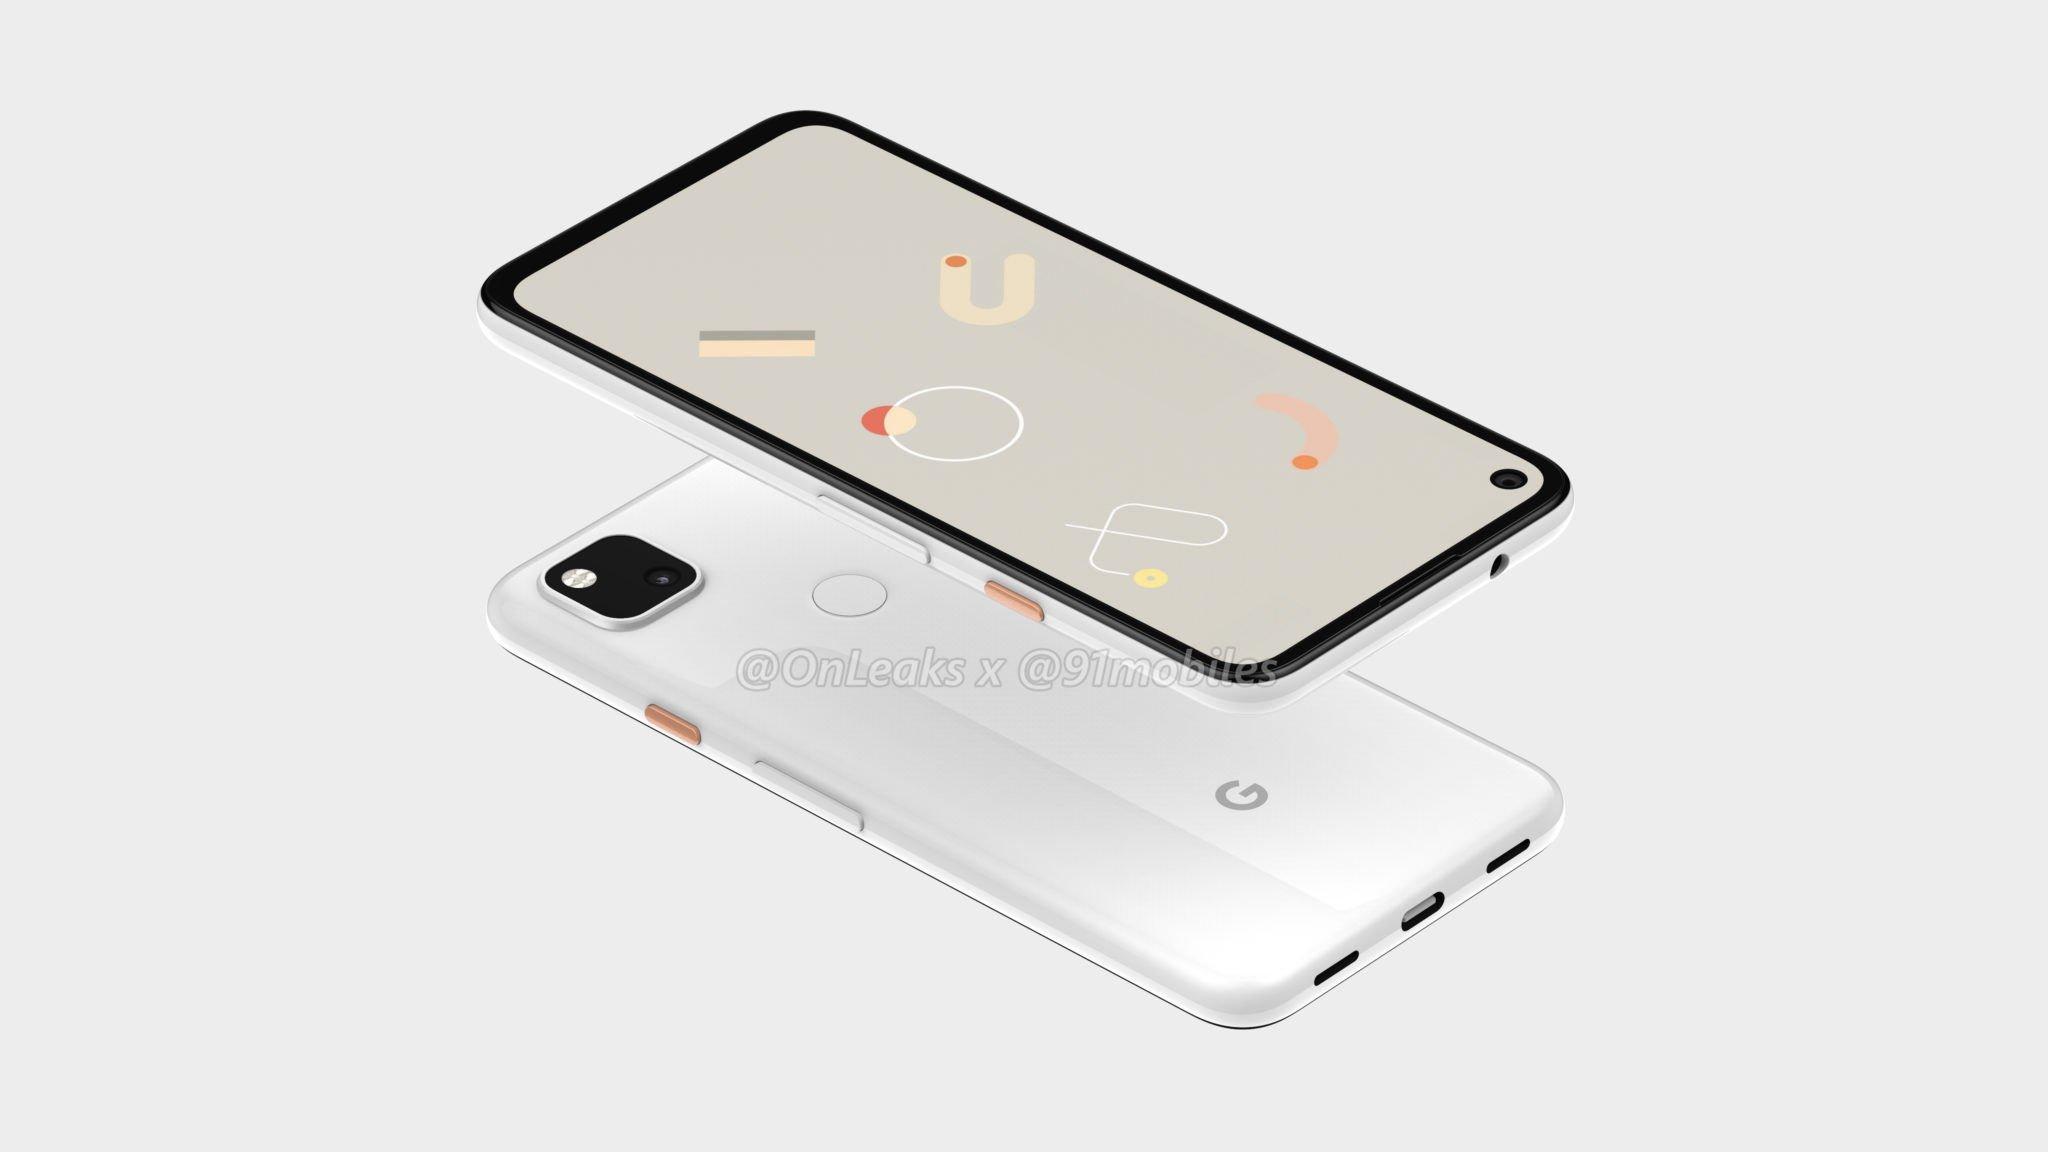 Pixel 4aシリーズ、低価格で5G対応か